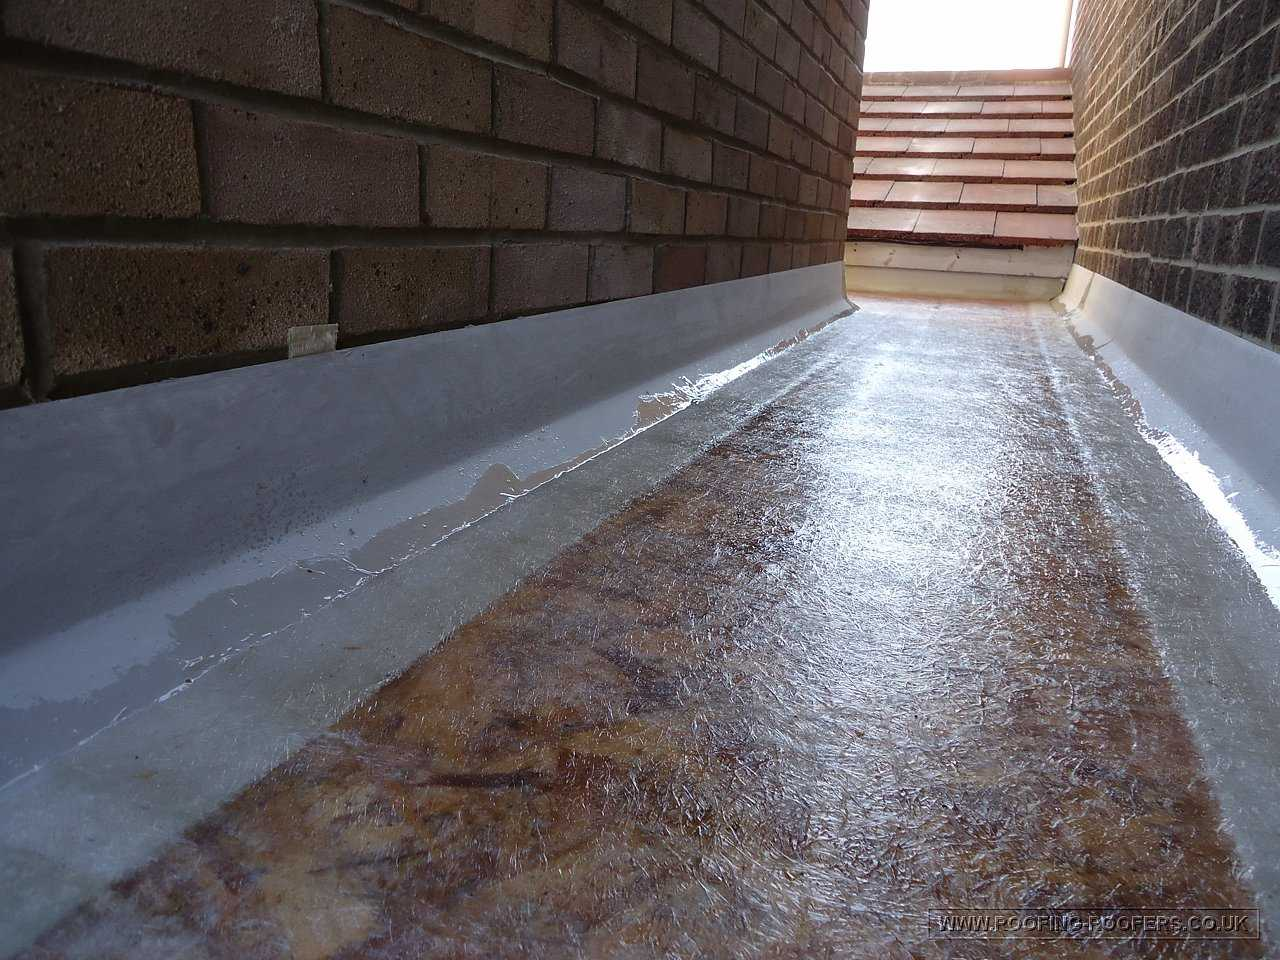 Grp Fibreglass Roof Installation Company Cost